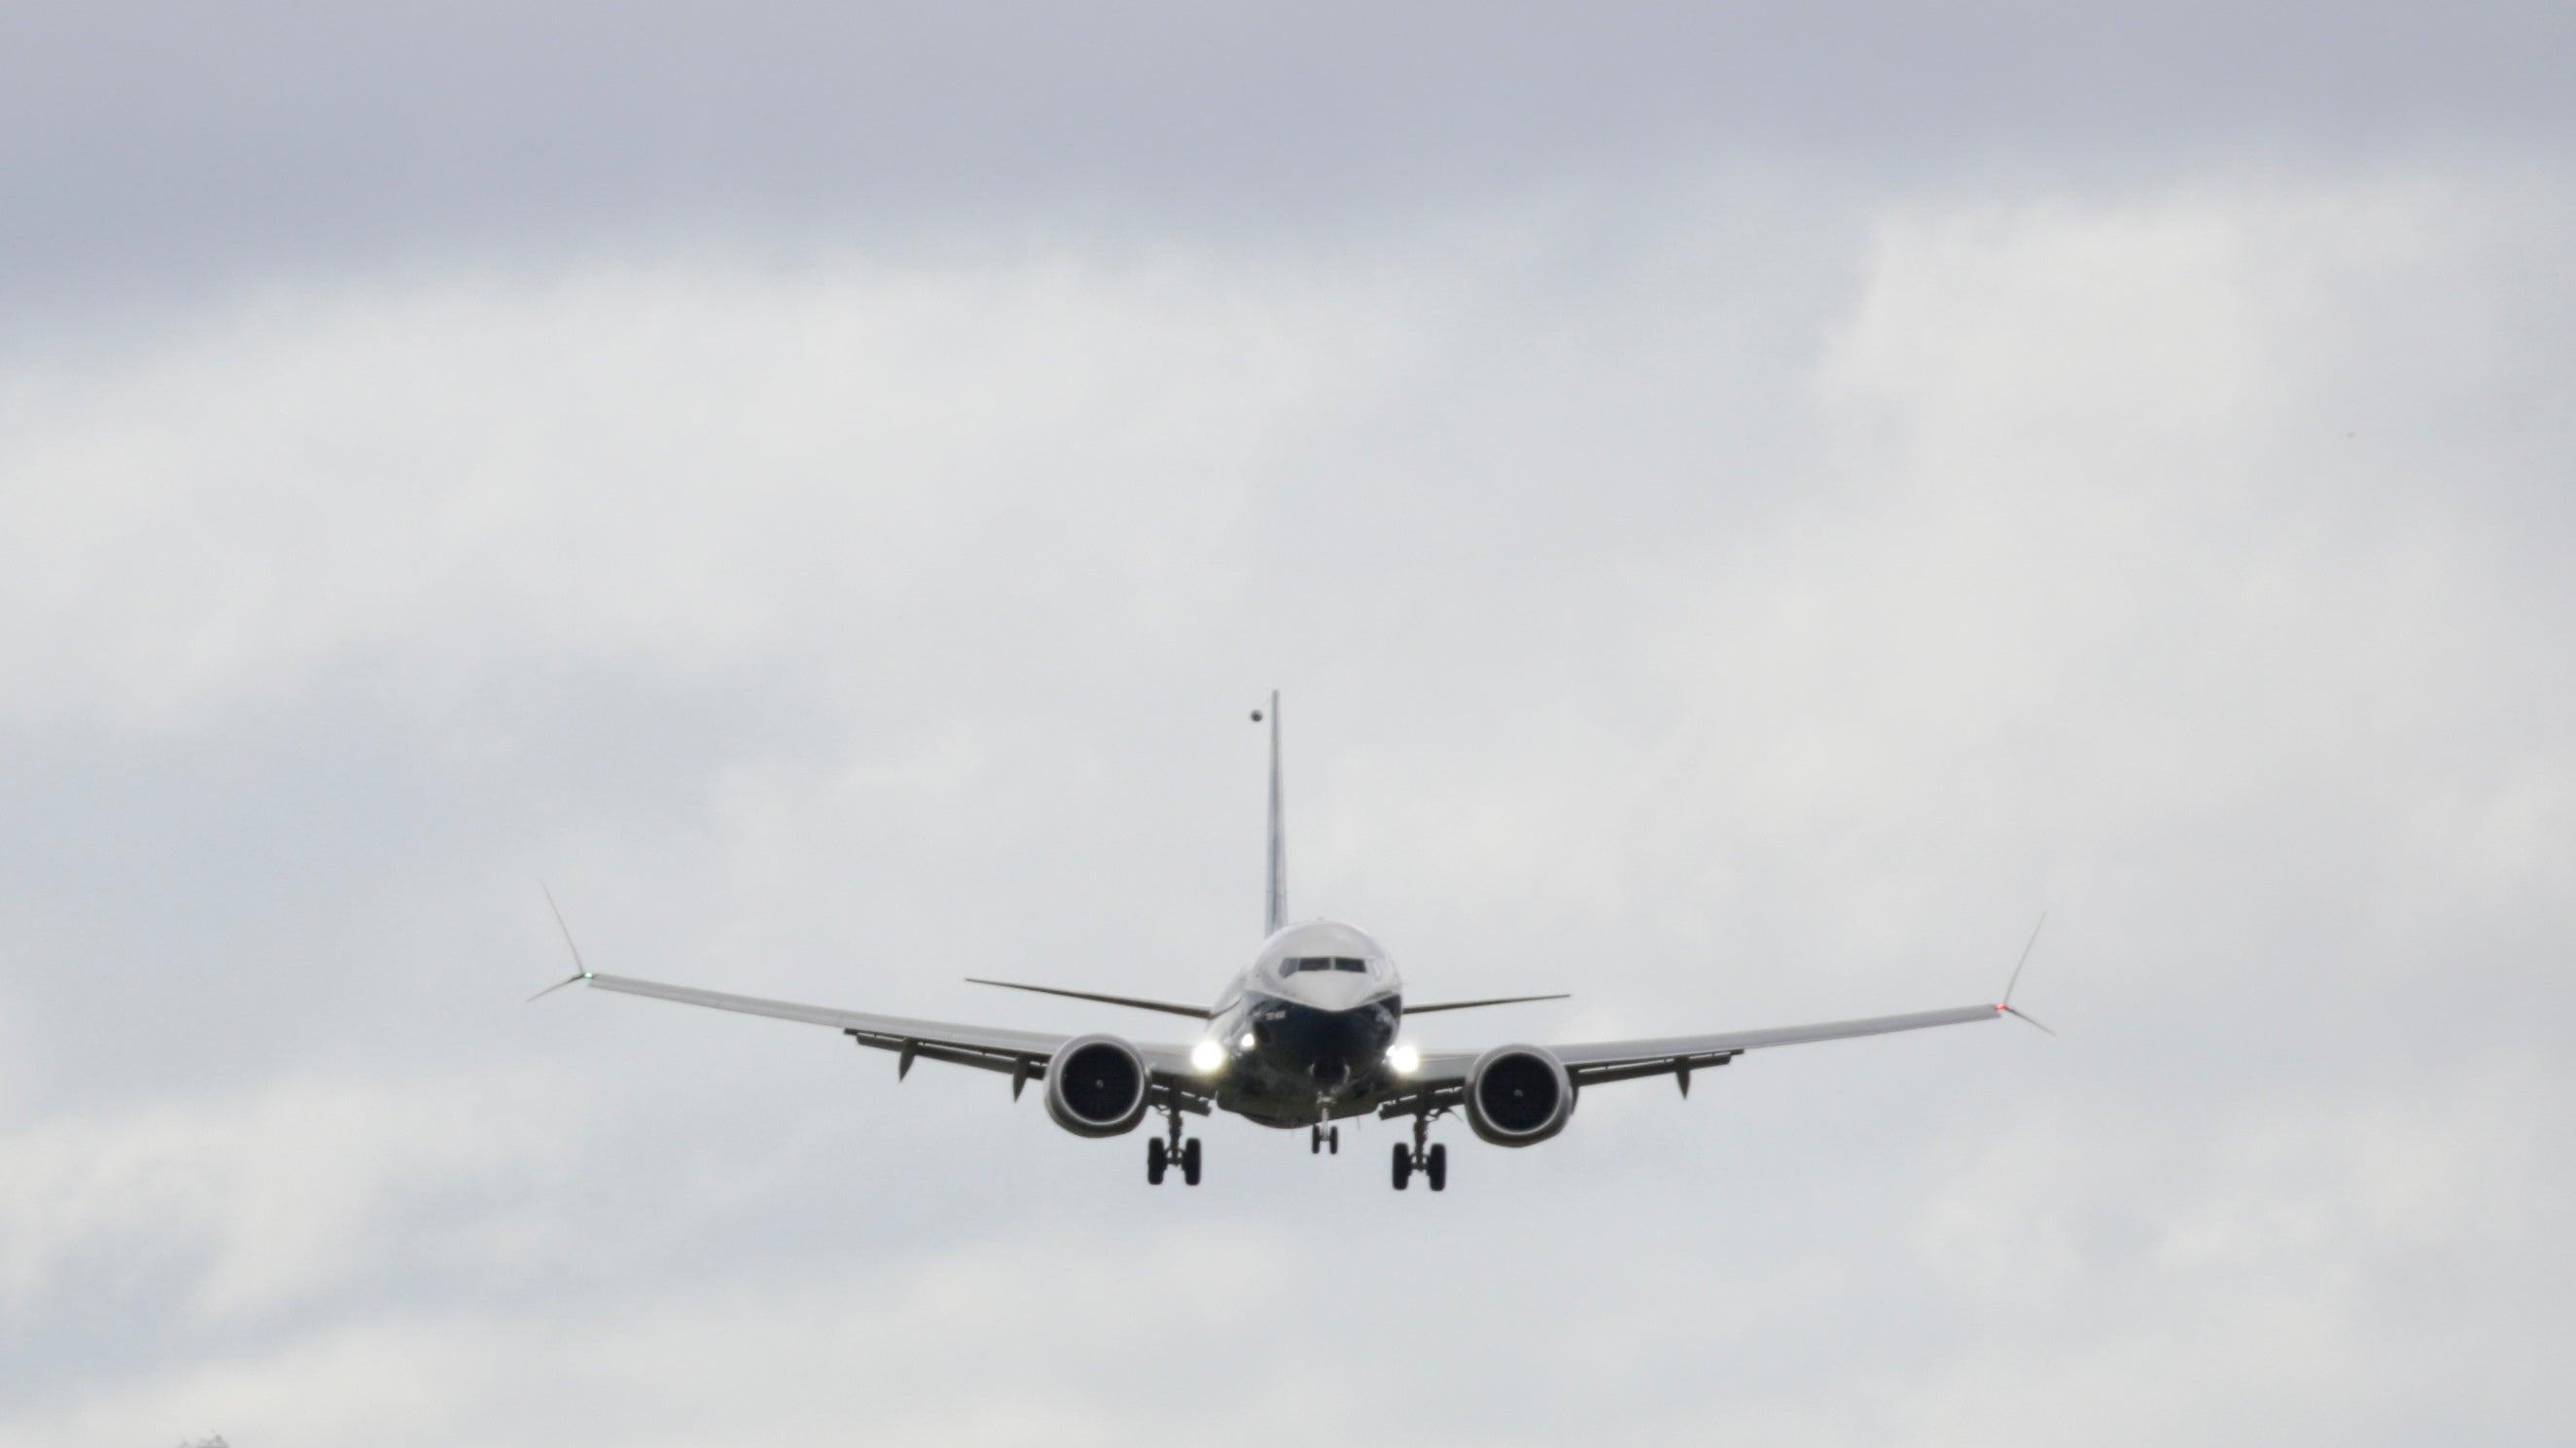 Vaping Pilot Trying To Hide E-Cig Cloud Accidentally Sends Passenger Flight Plummeting